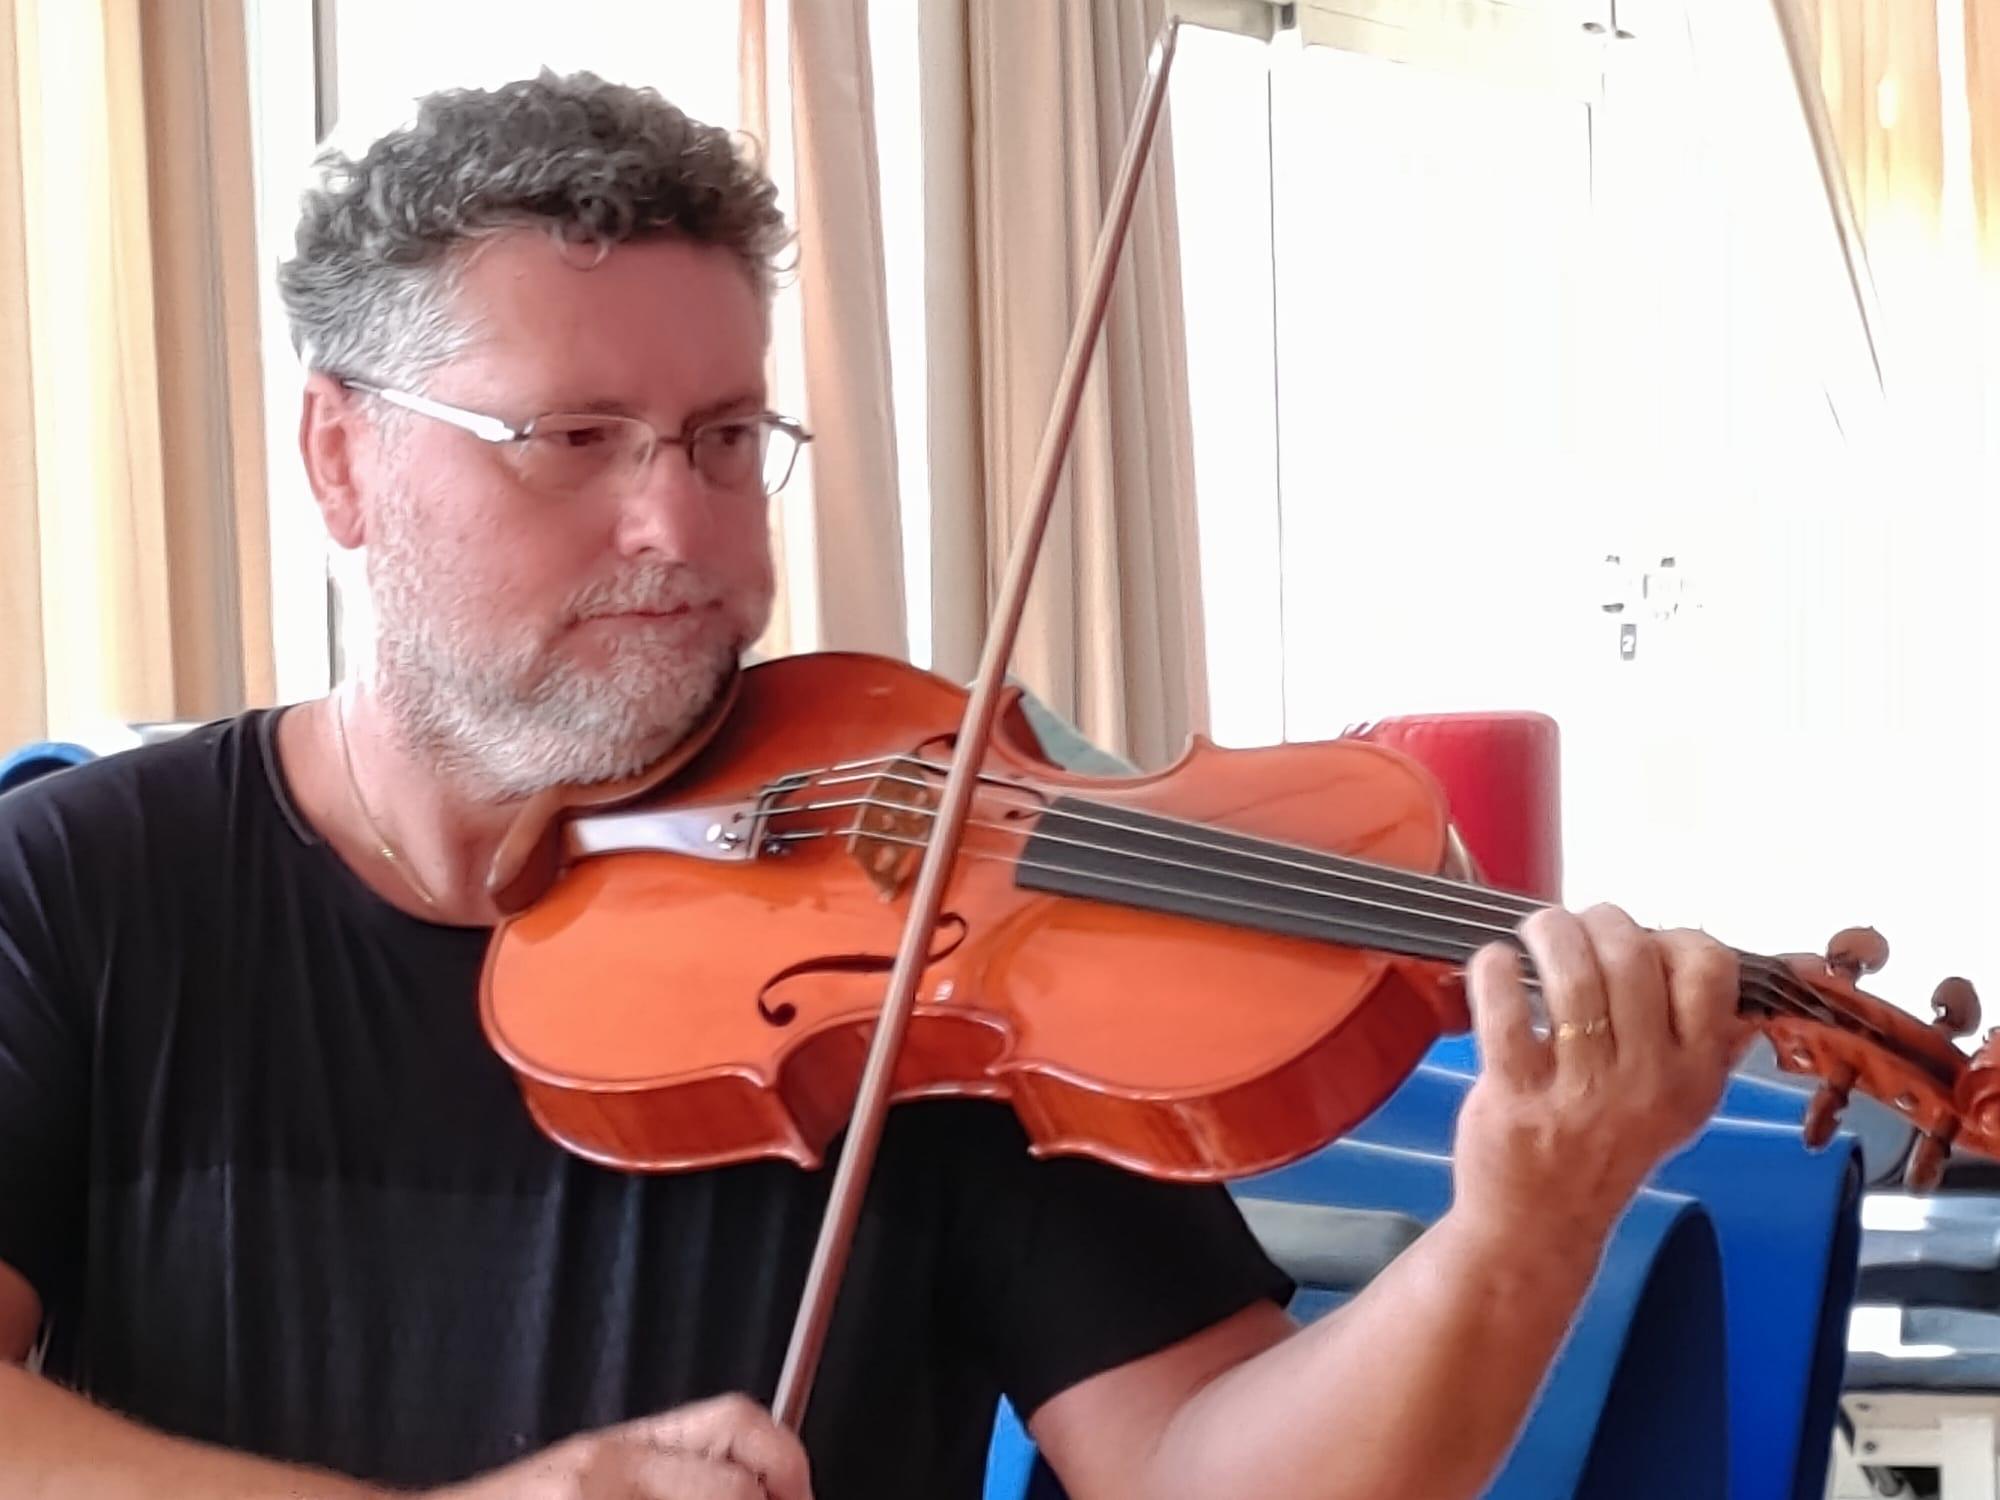 PietroScalvini